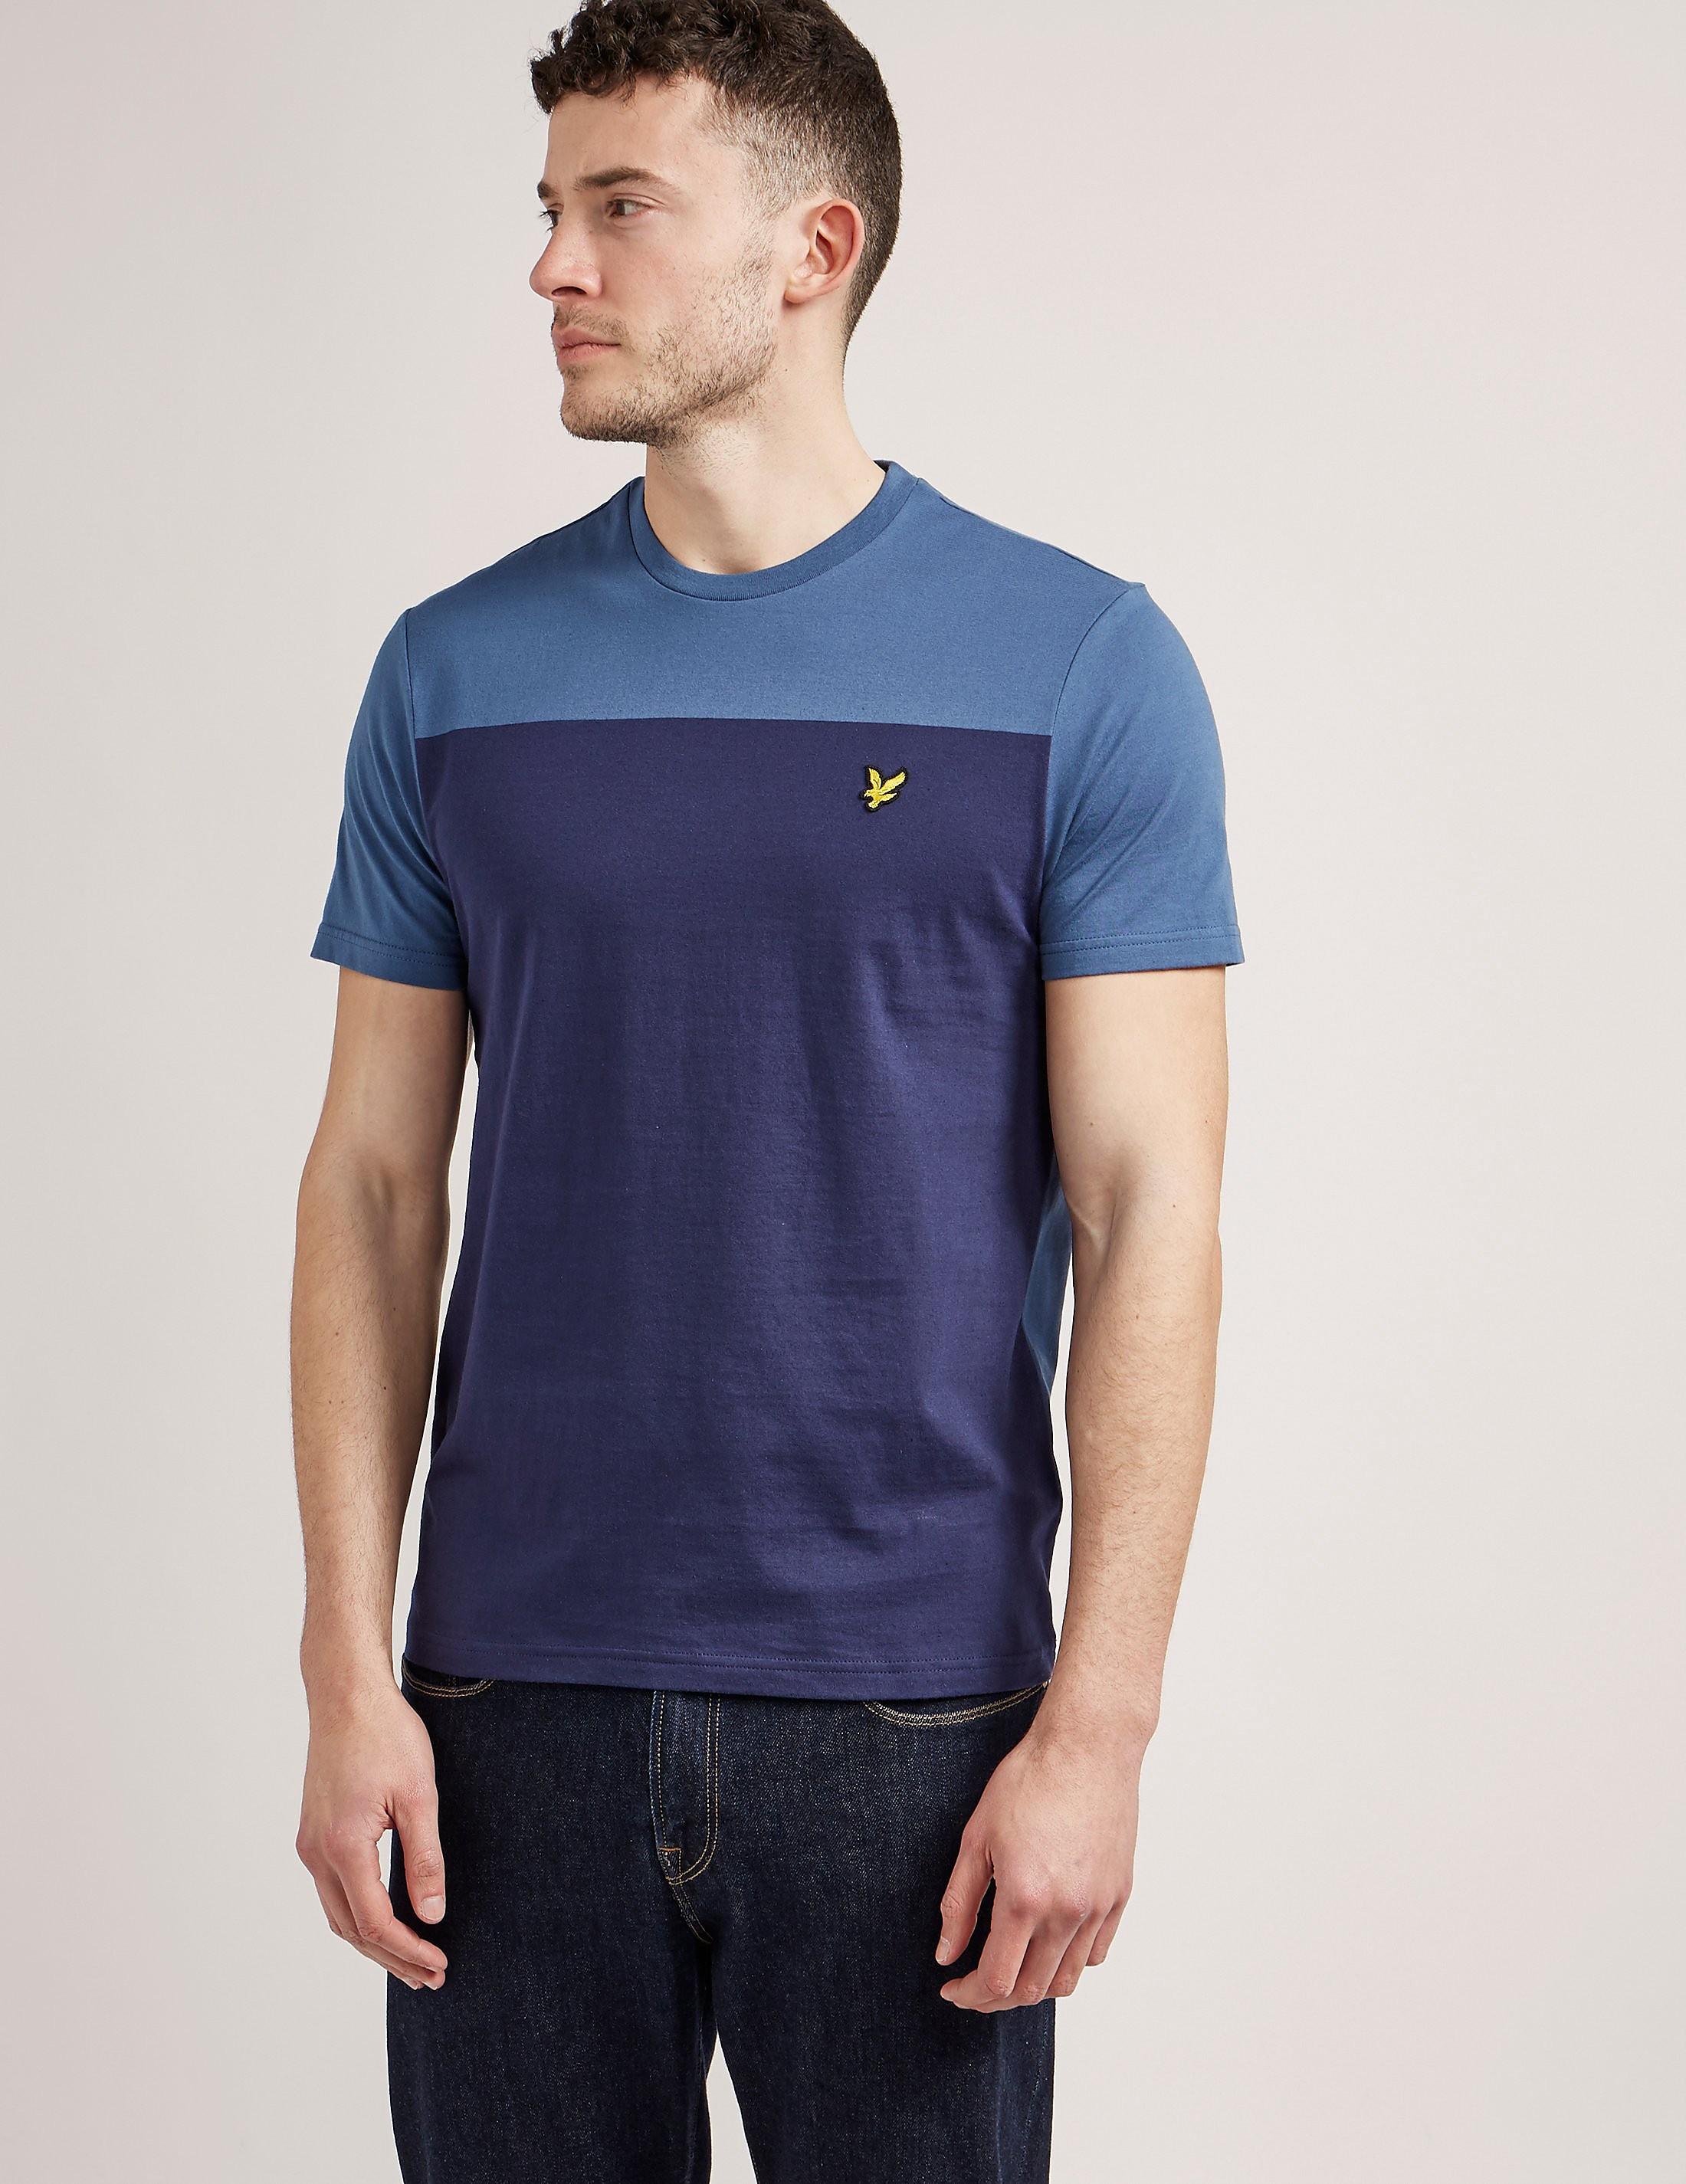 Lyle & Scott Yoke Short Sleeve T-Shirt